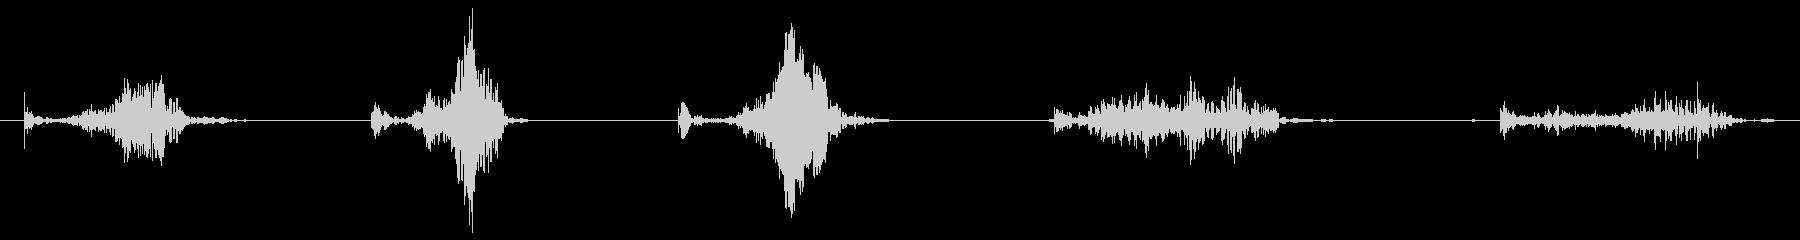 ASMR 段ボールをひっかく音の未再生の波形